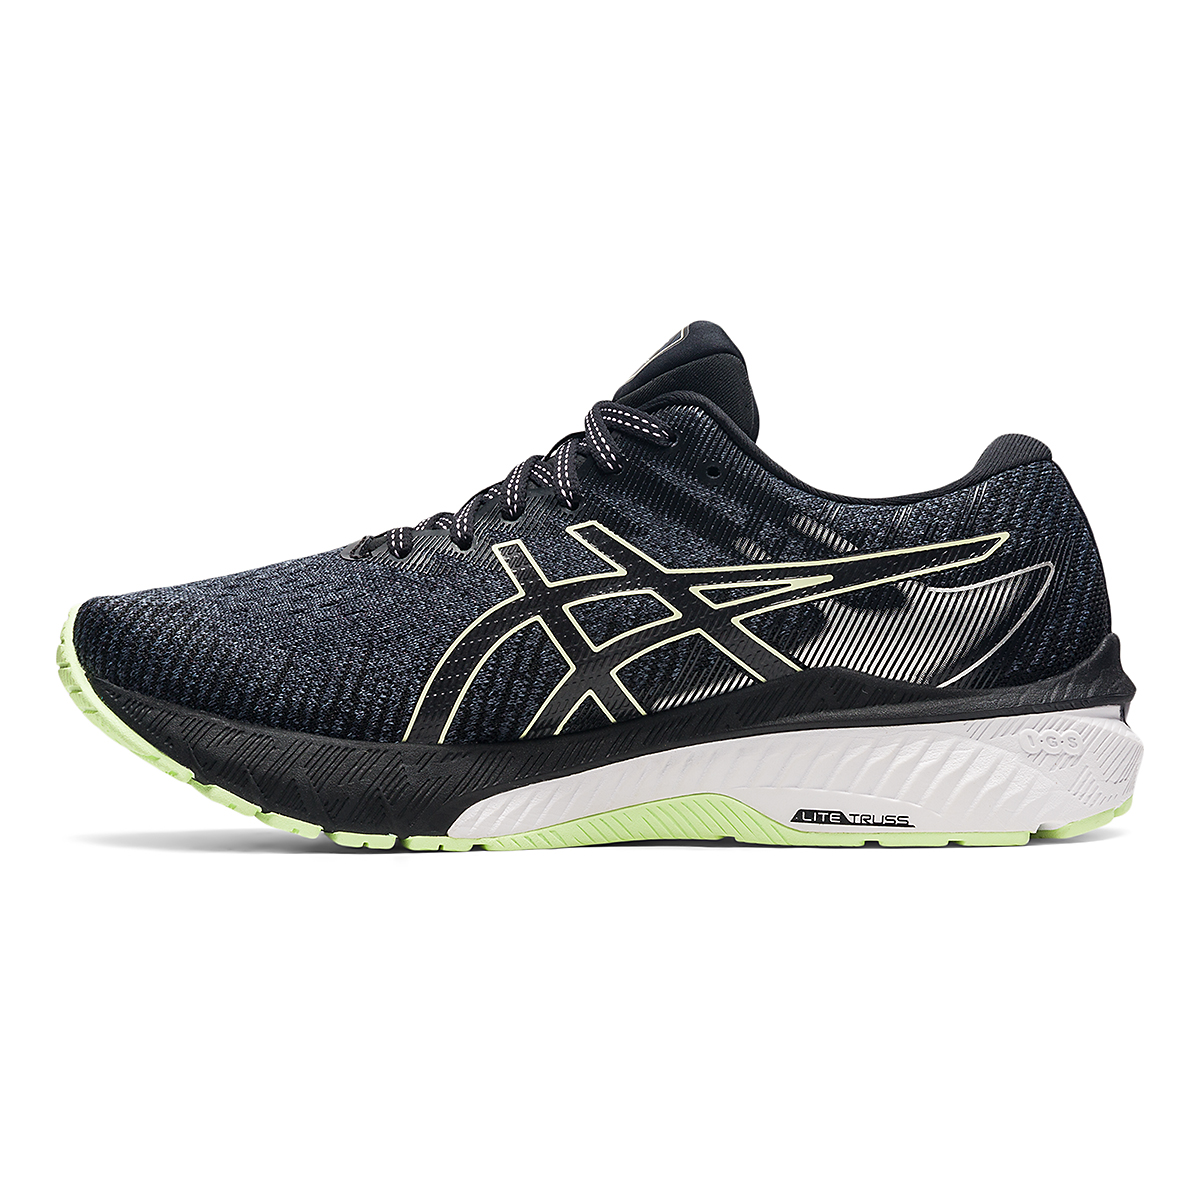 Women's Asics GT-2000 10 Running Shoe - Color: Soft Lavender/Black - Size: 5 - Width: Wide, Soft Lavender/Black, large, image 2